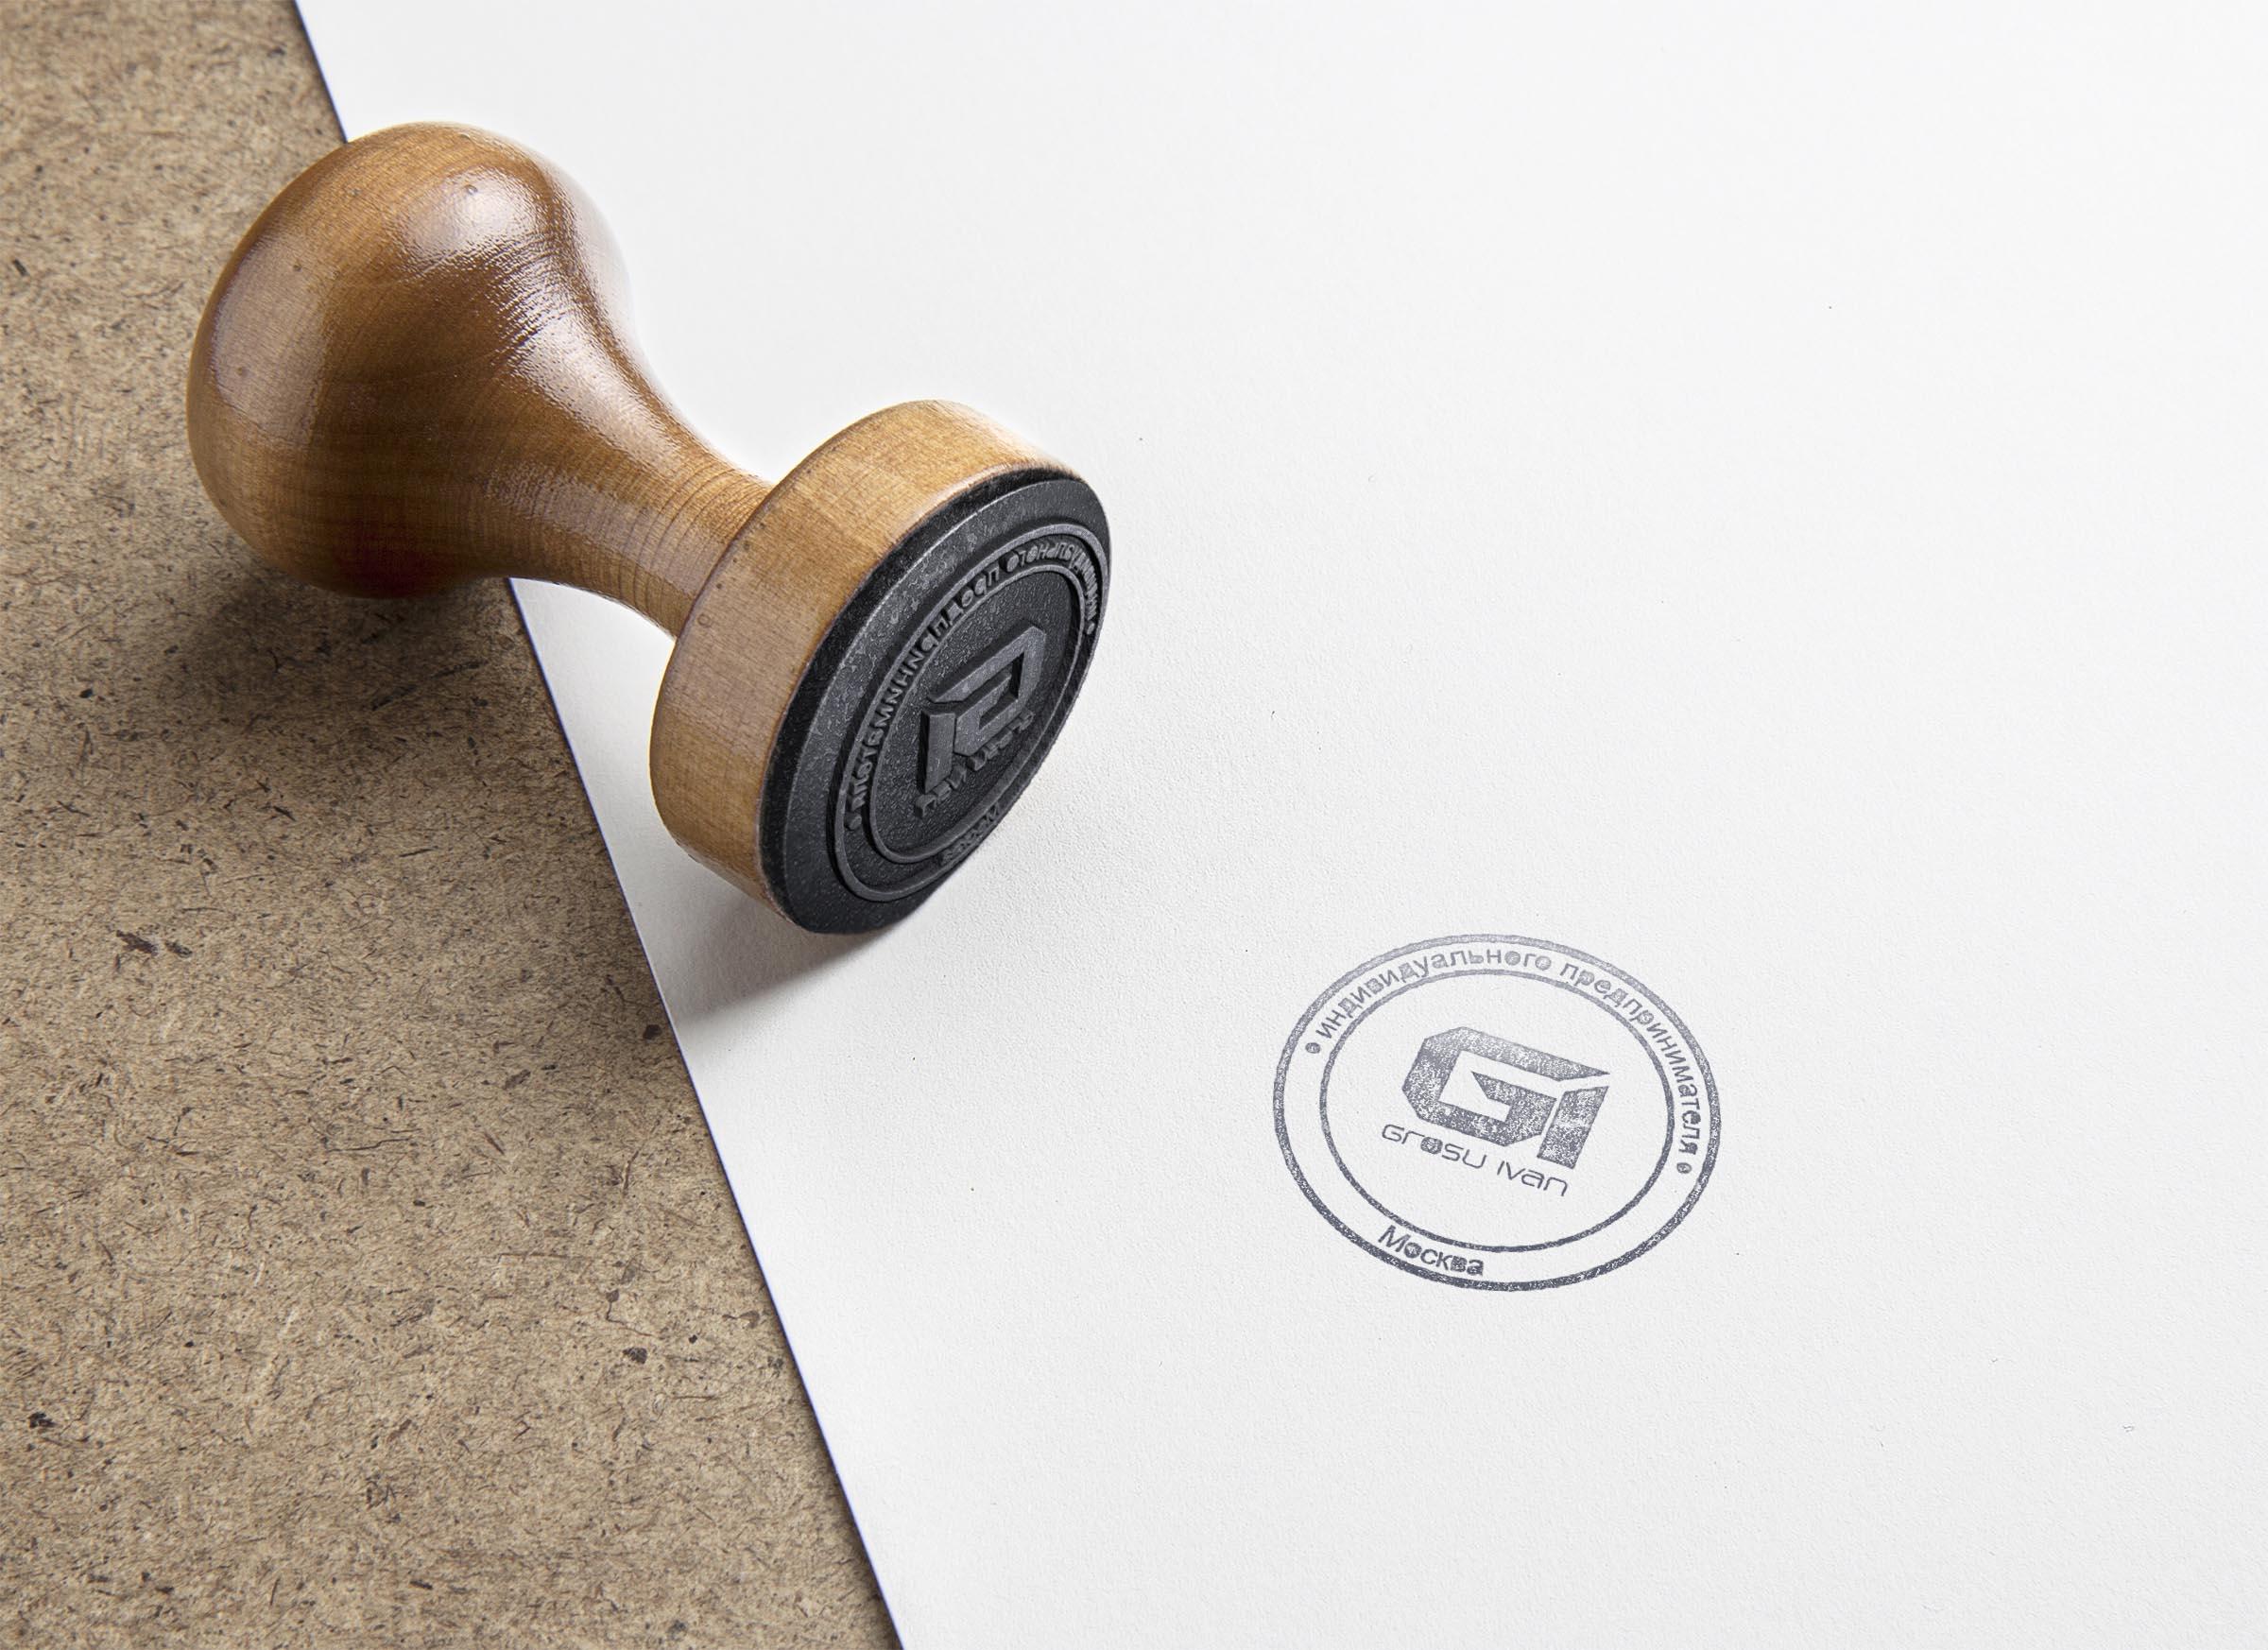 Фамильный логотип и дизайн печати ИП с этим логотипом фото f_1175a2838c84f8f7.jpg